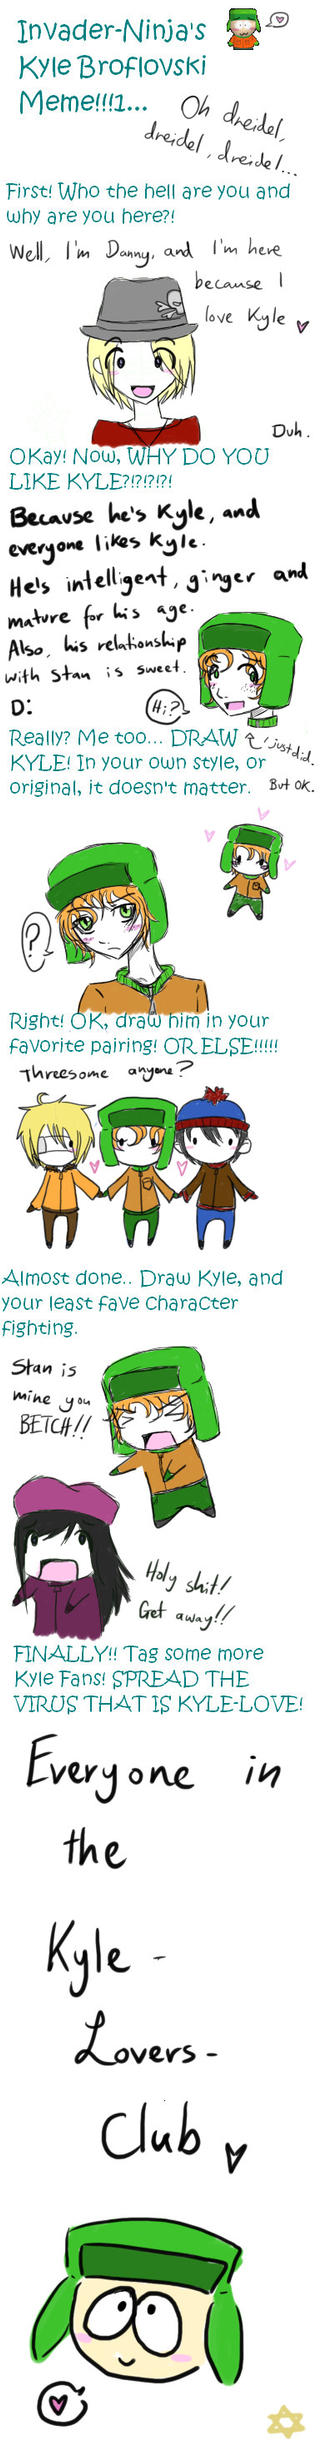 SP: Kyle Broflovski meme by Kyle-Lovers-Club